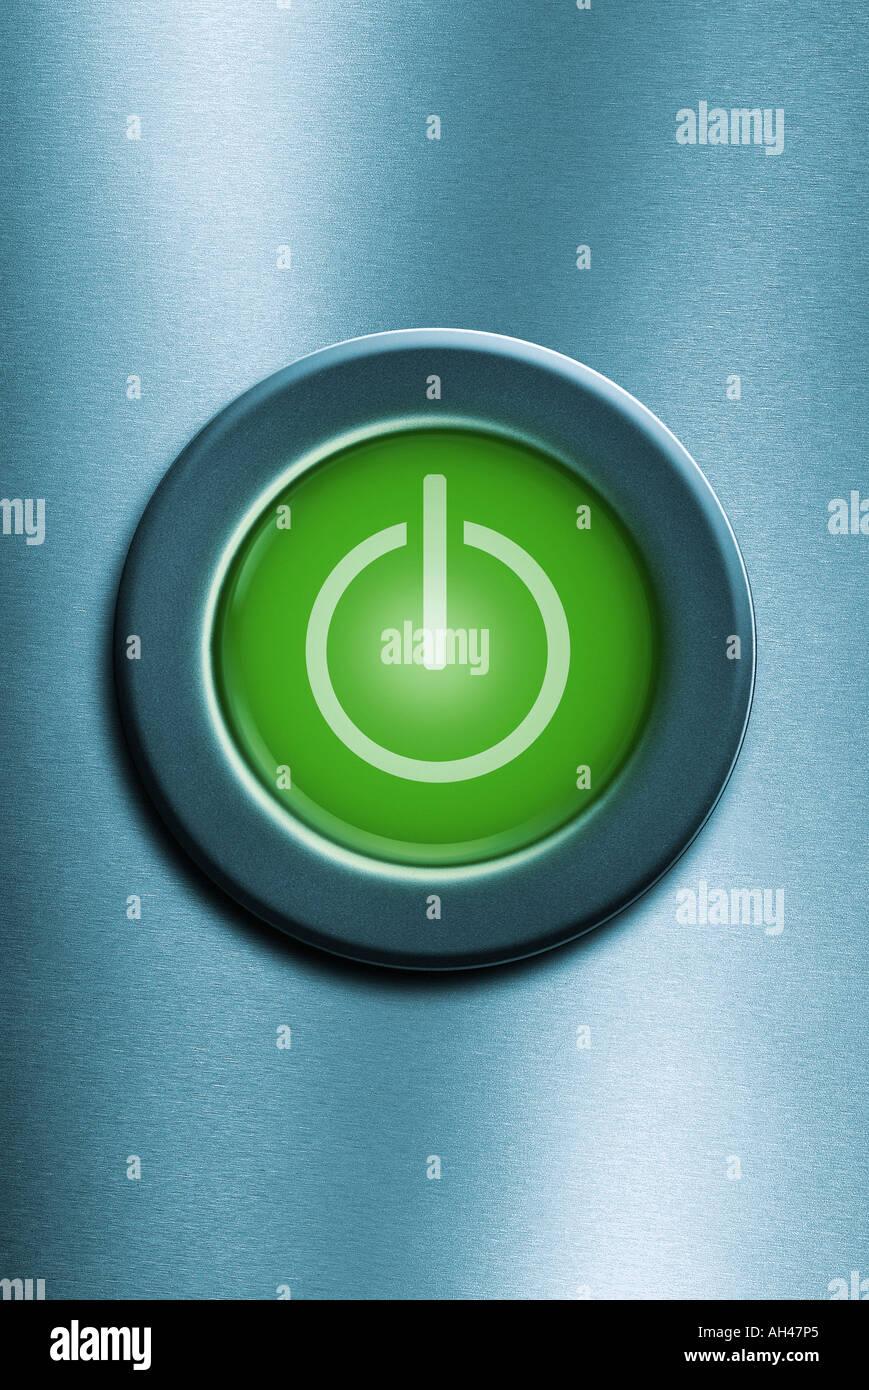 power switch knob button Power Taste - Stock Image